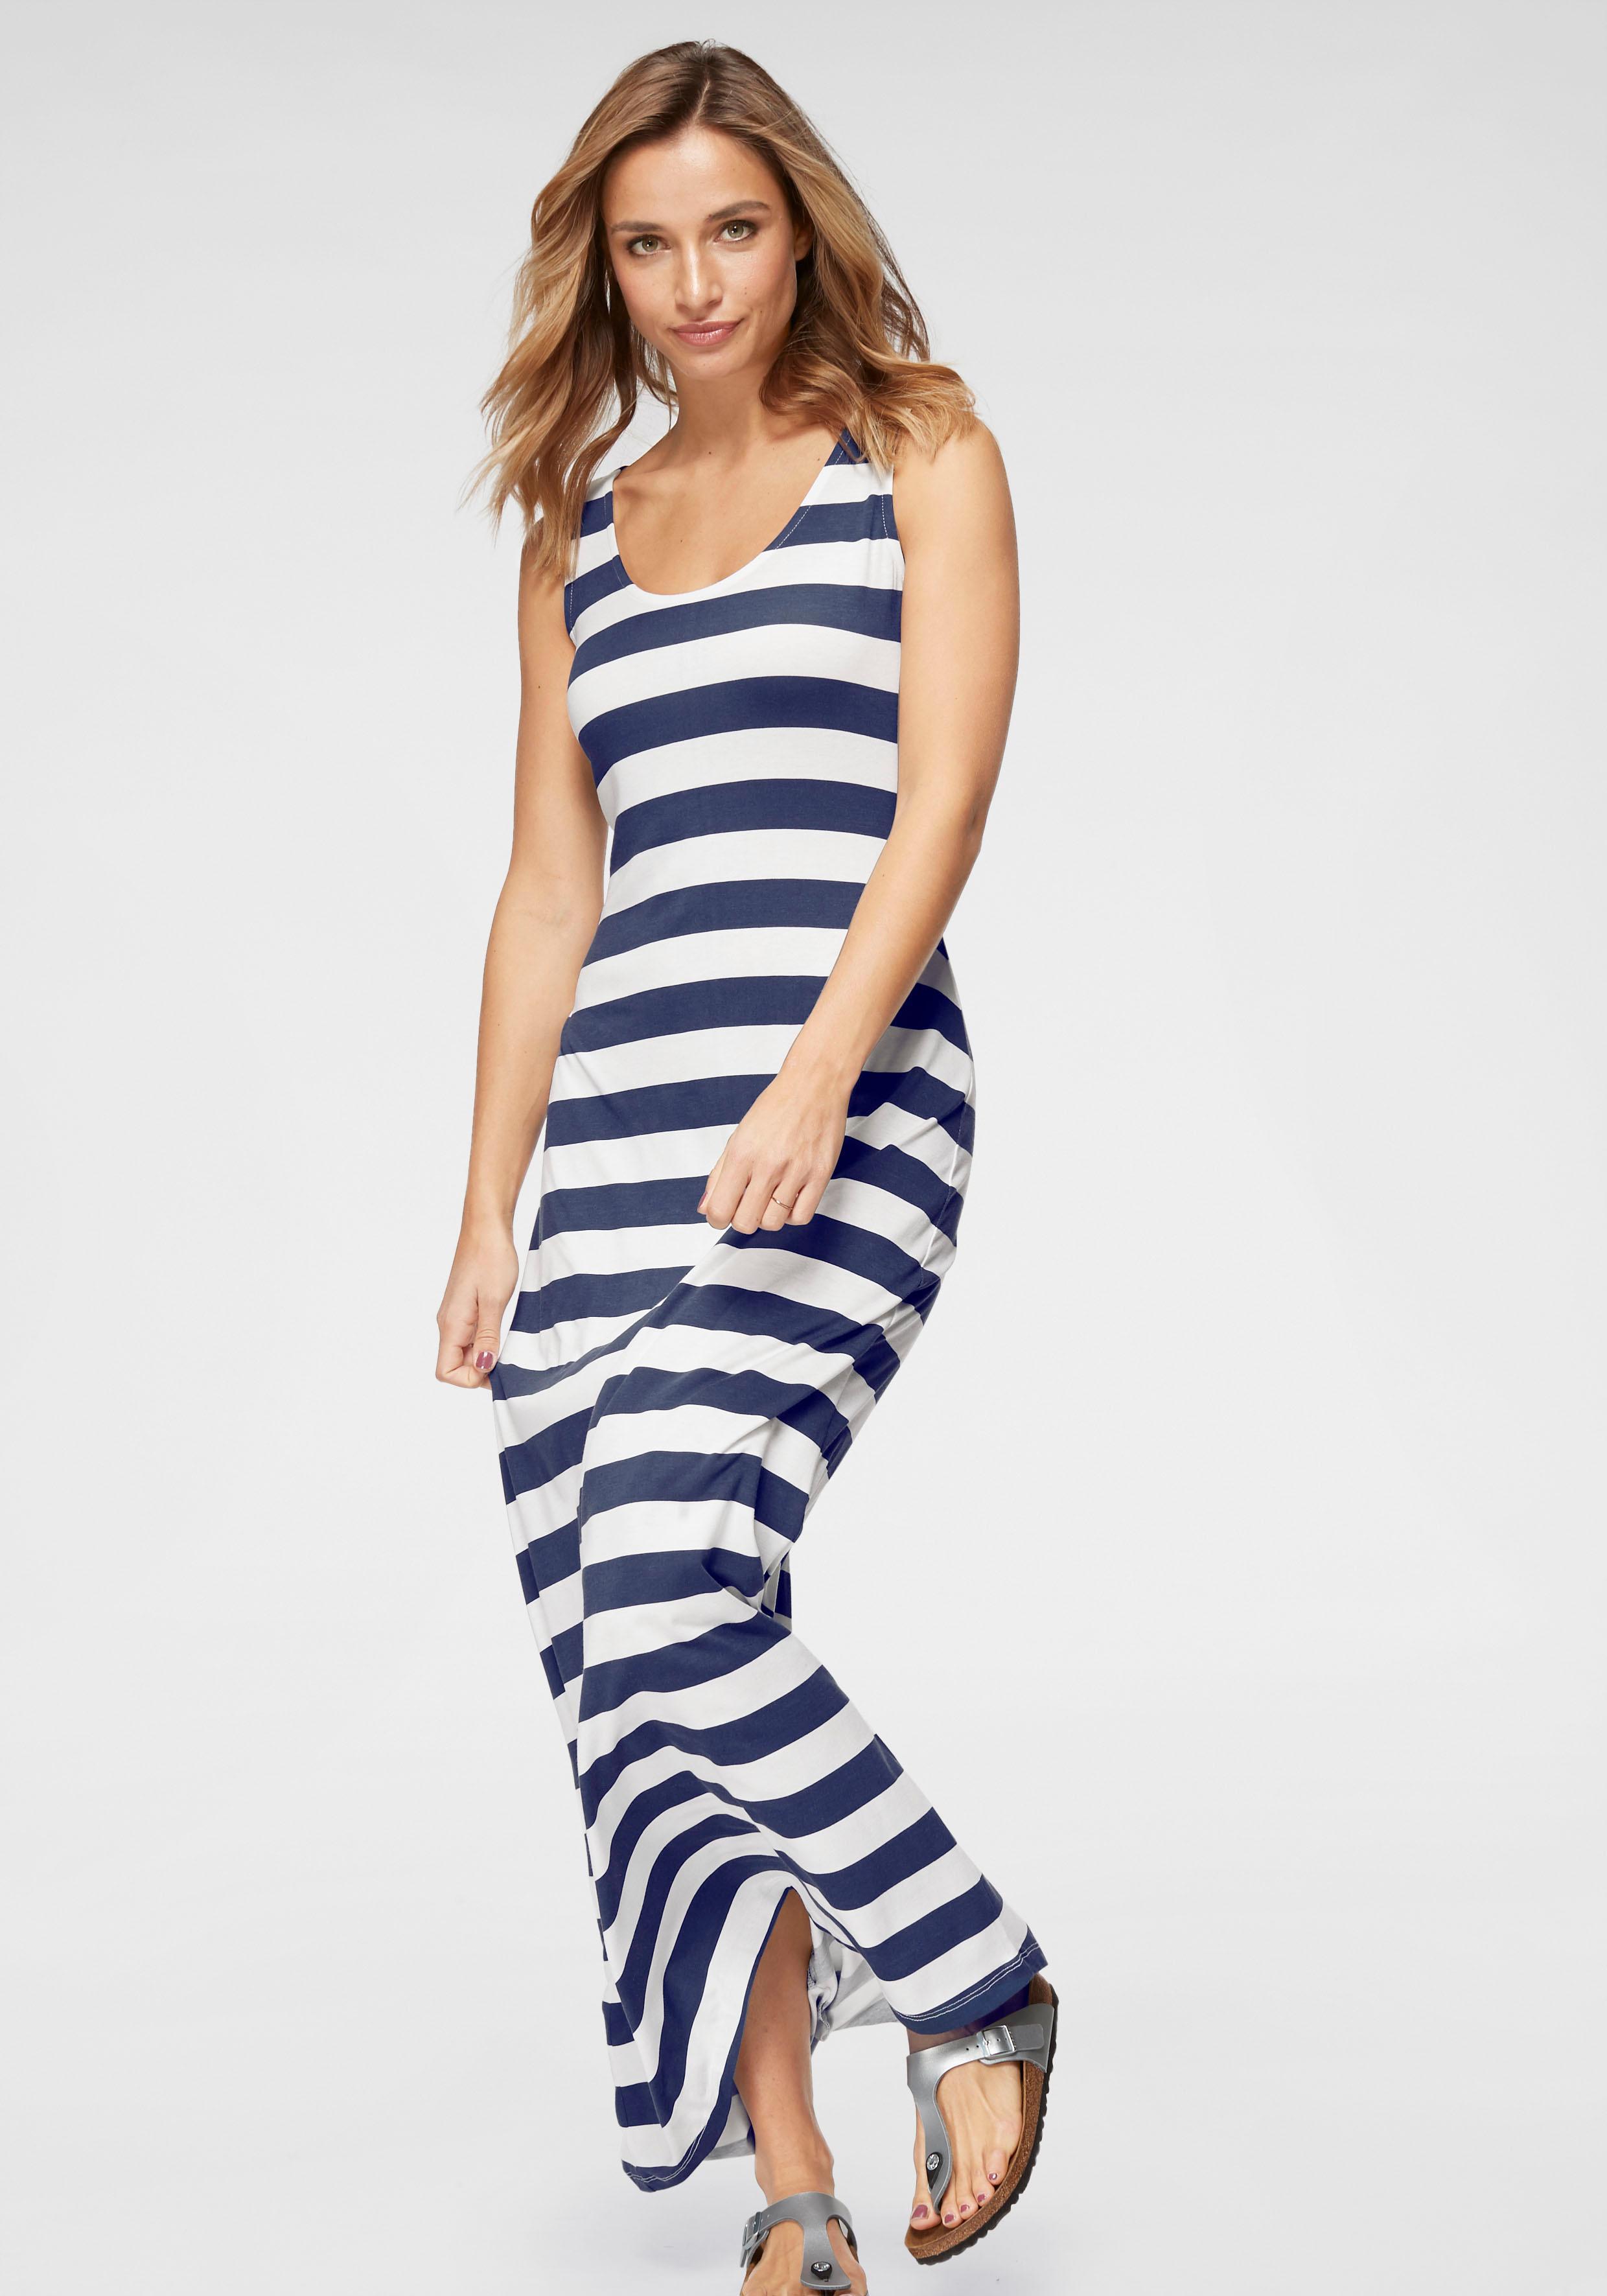 Sommerkleid Sommerkleid Sommer-Kleid Damen  Kleider  Kleider Aniston By By By Baur  Ma | Elegant  | Ermäßigung  1d5c82